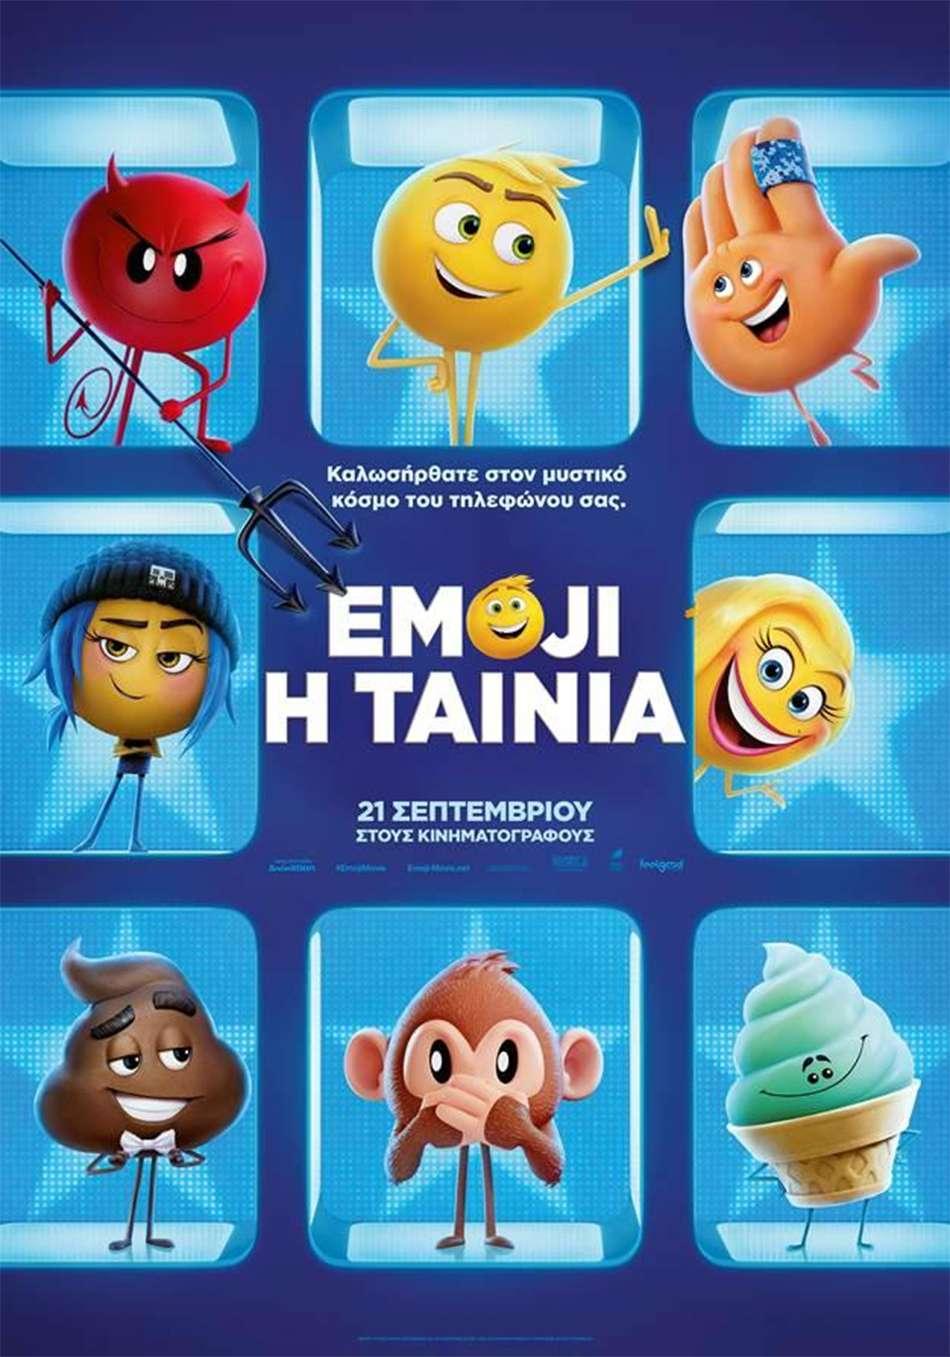 Emoji, Η Ταινία (The Emoji Movie) Poster Πόστερ